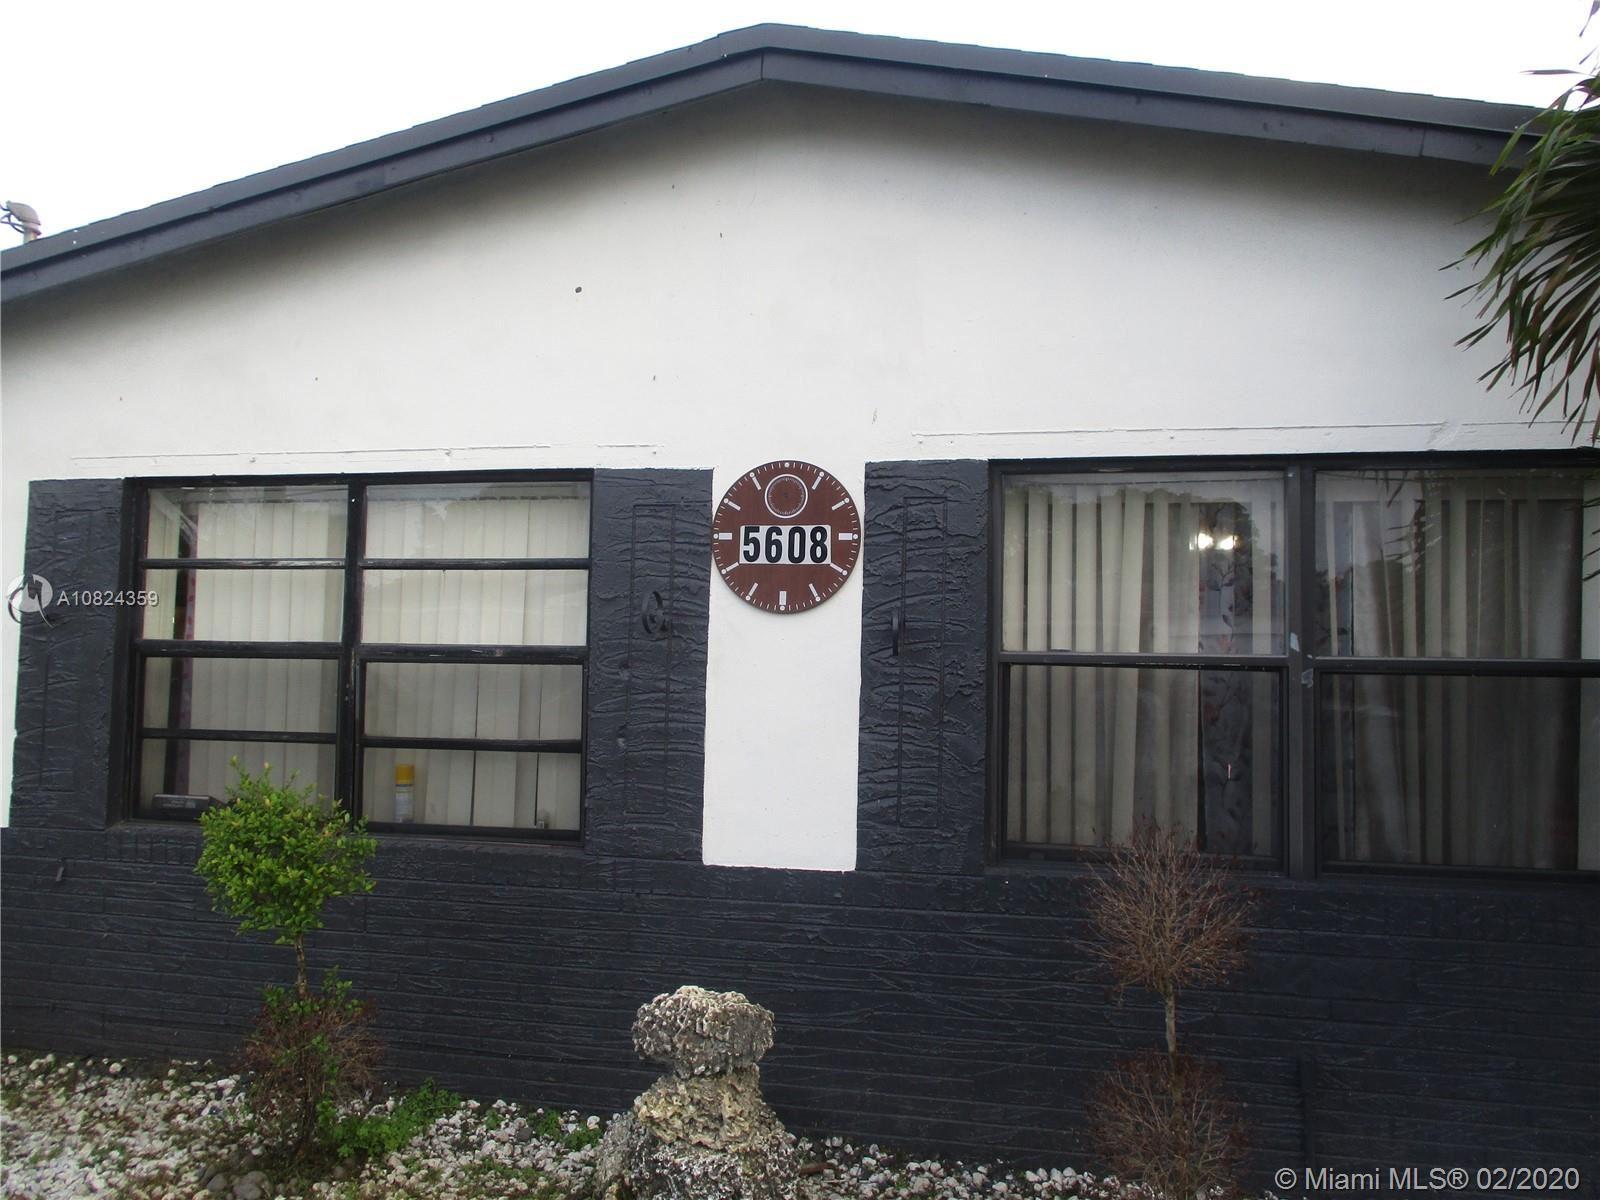 5608 Fletcher St, Hollywood, FL 33023 - #: A10824359